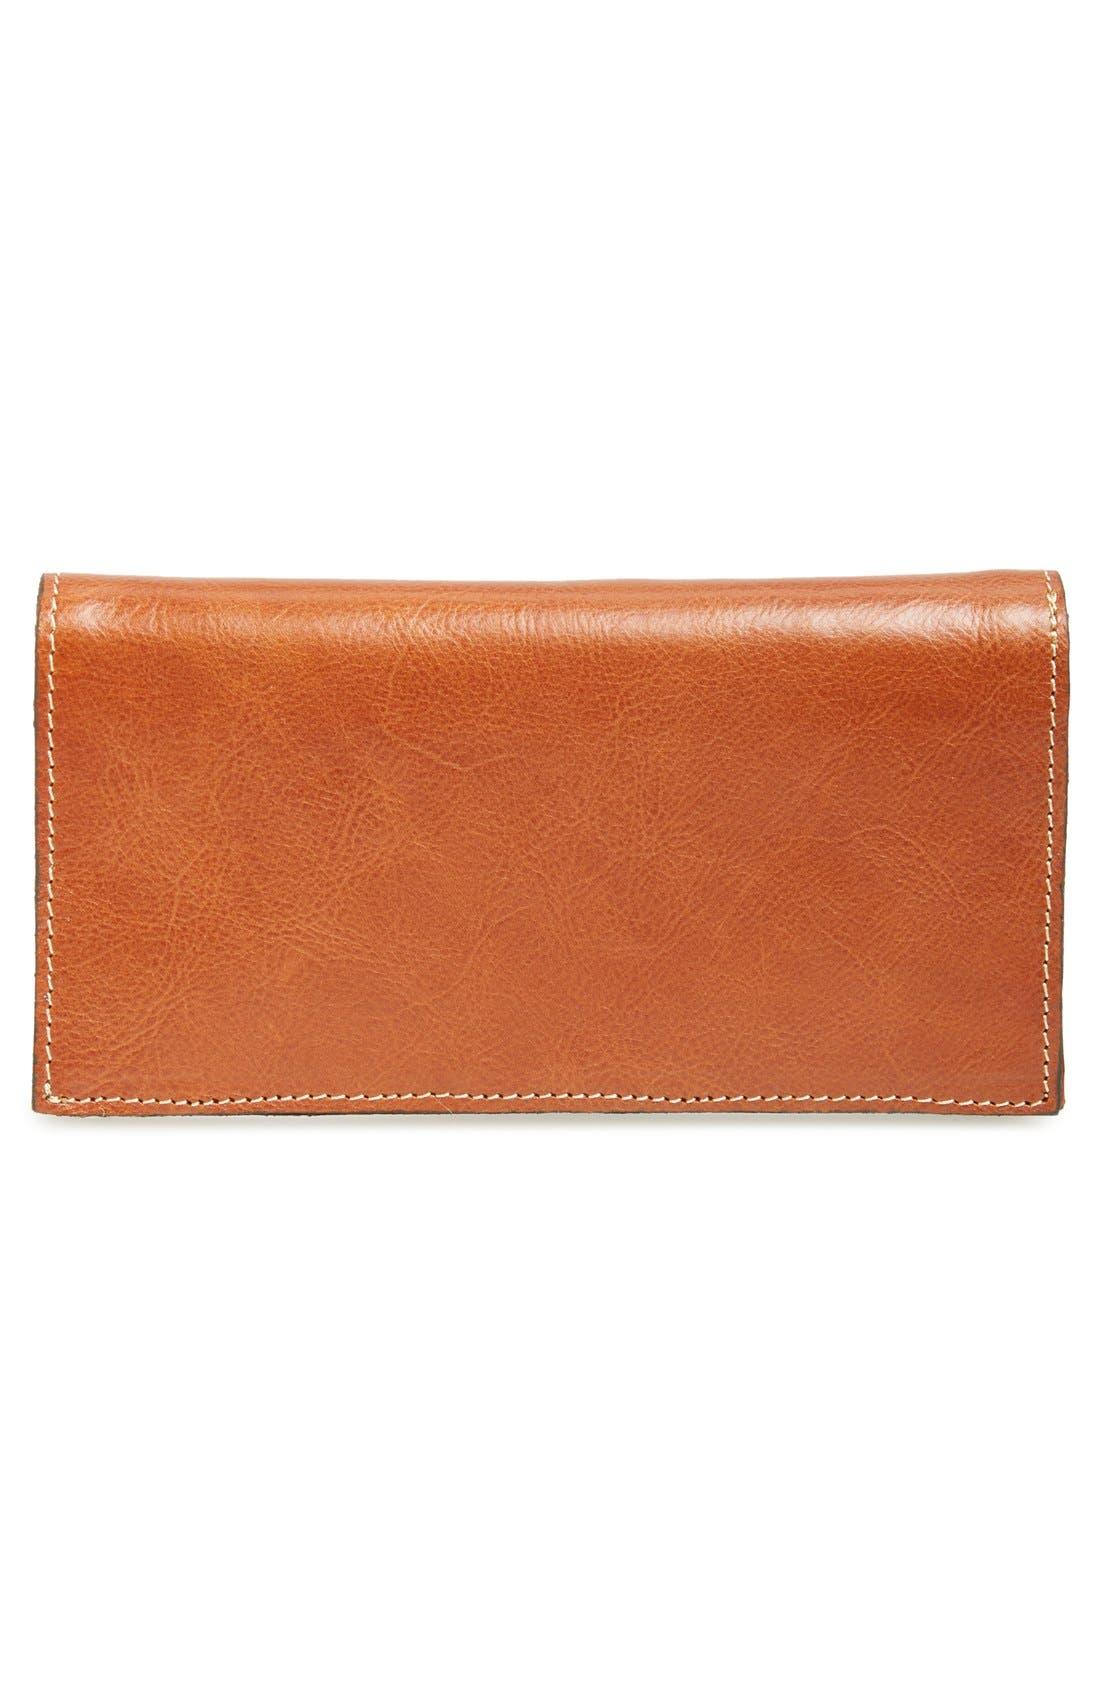 Alternate Image 3  - Patricia Nash 'Varesse' Wallet